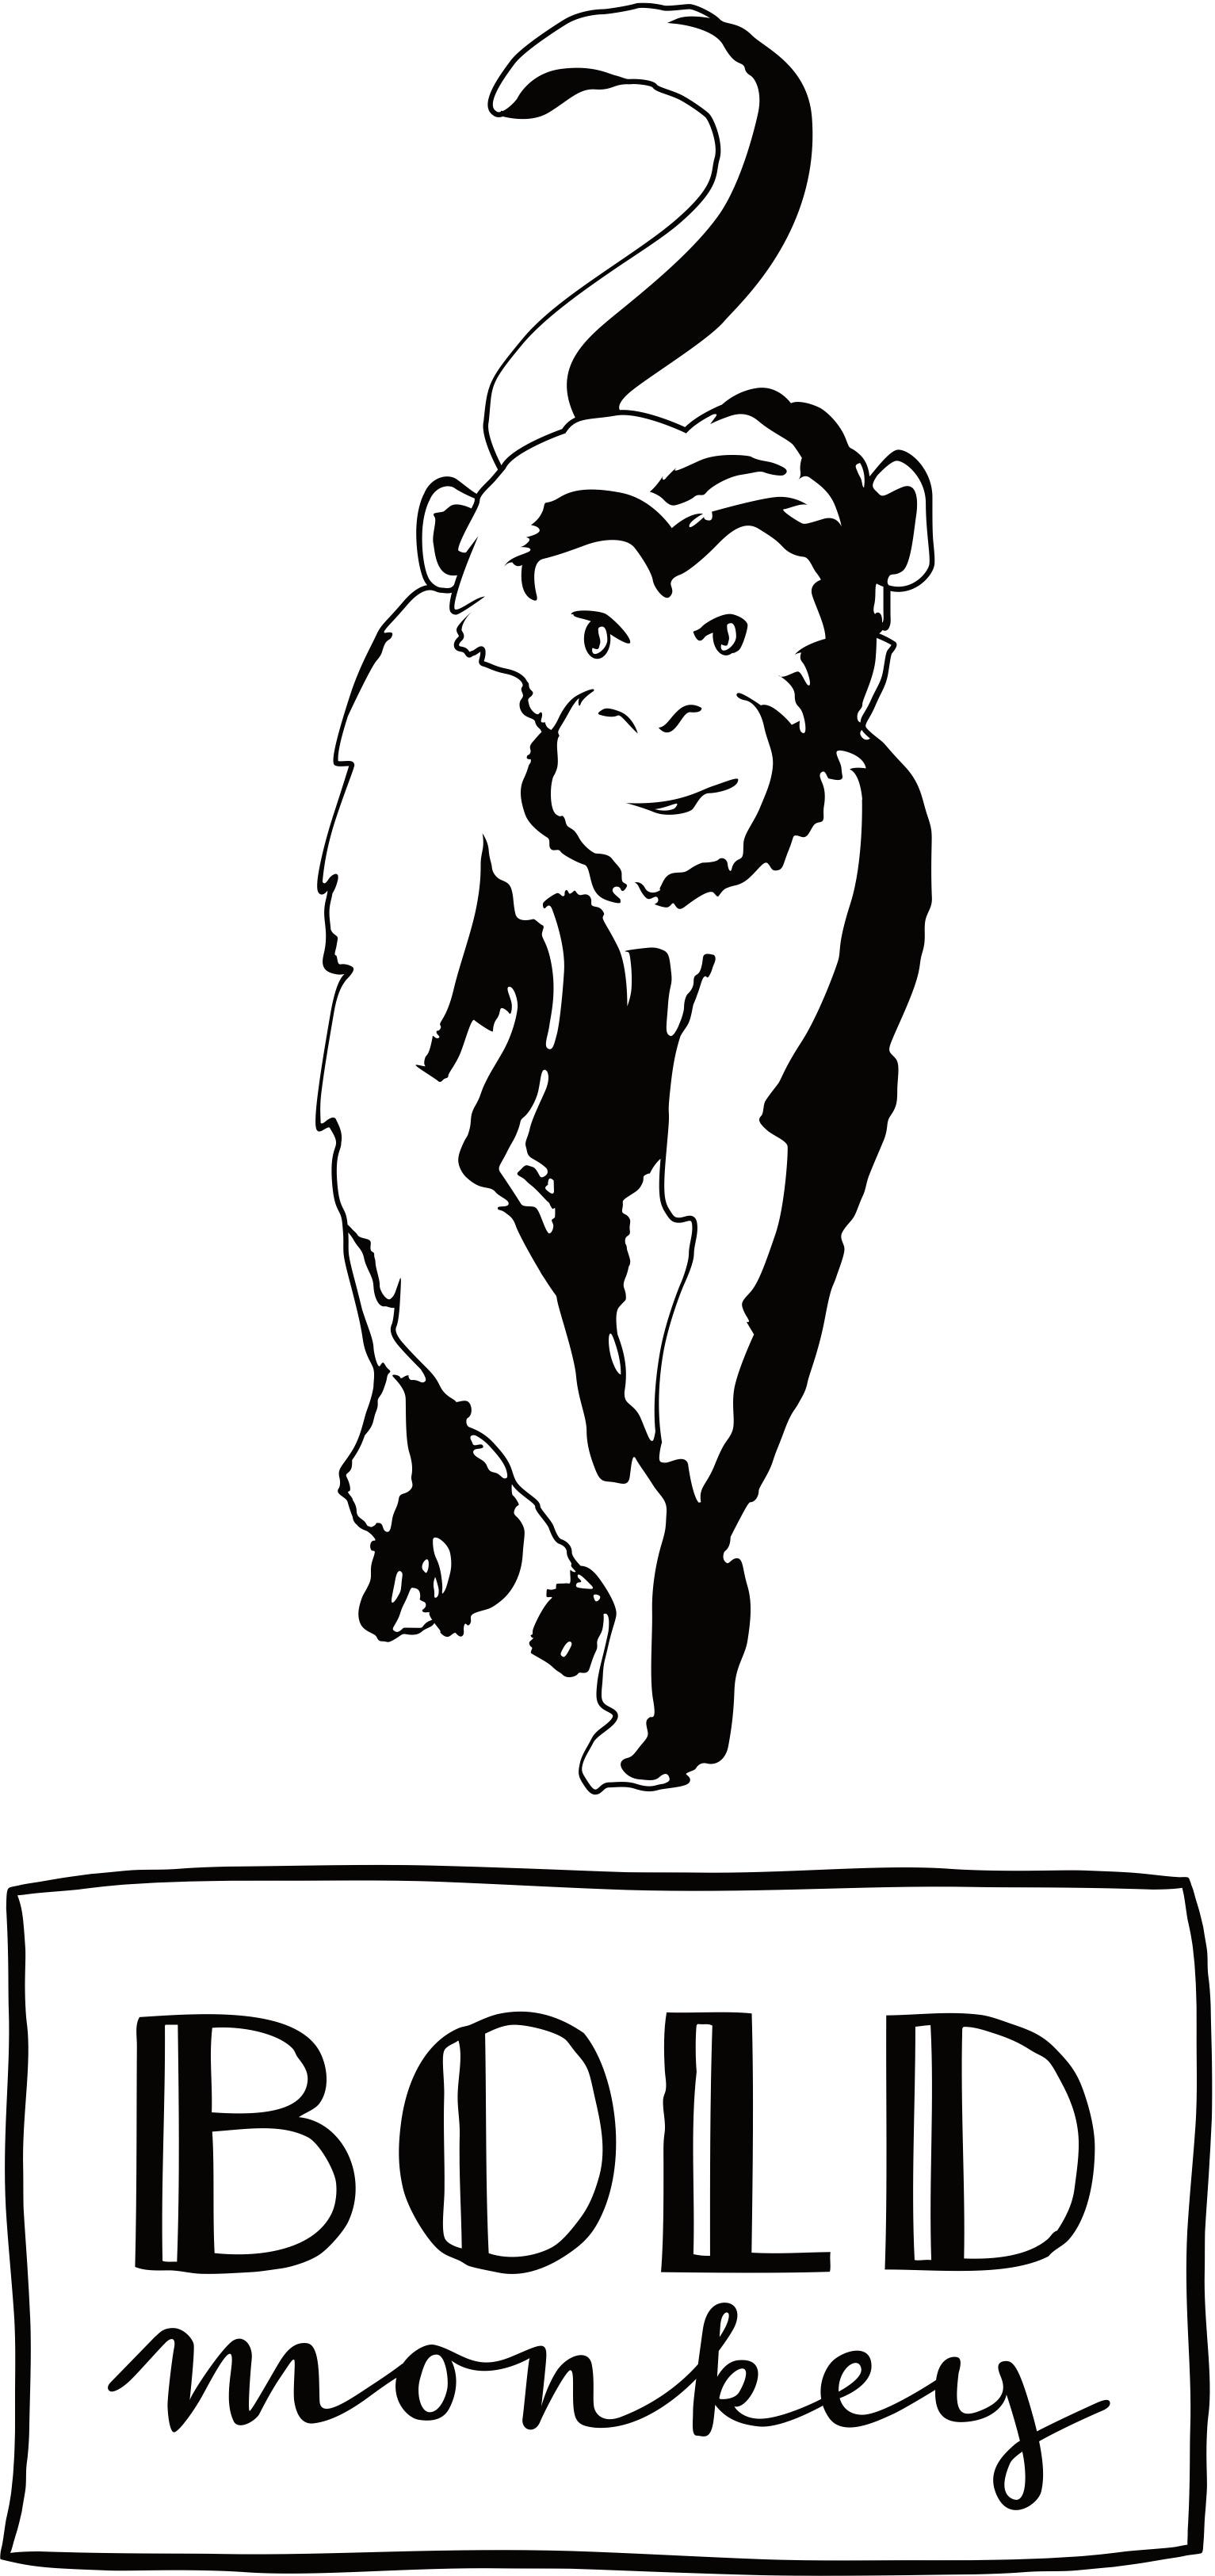 Bold Monkey I am not a croissant bank donker groen velvet gouden poten zijaanzicht